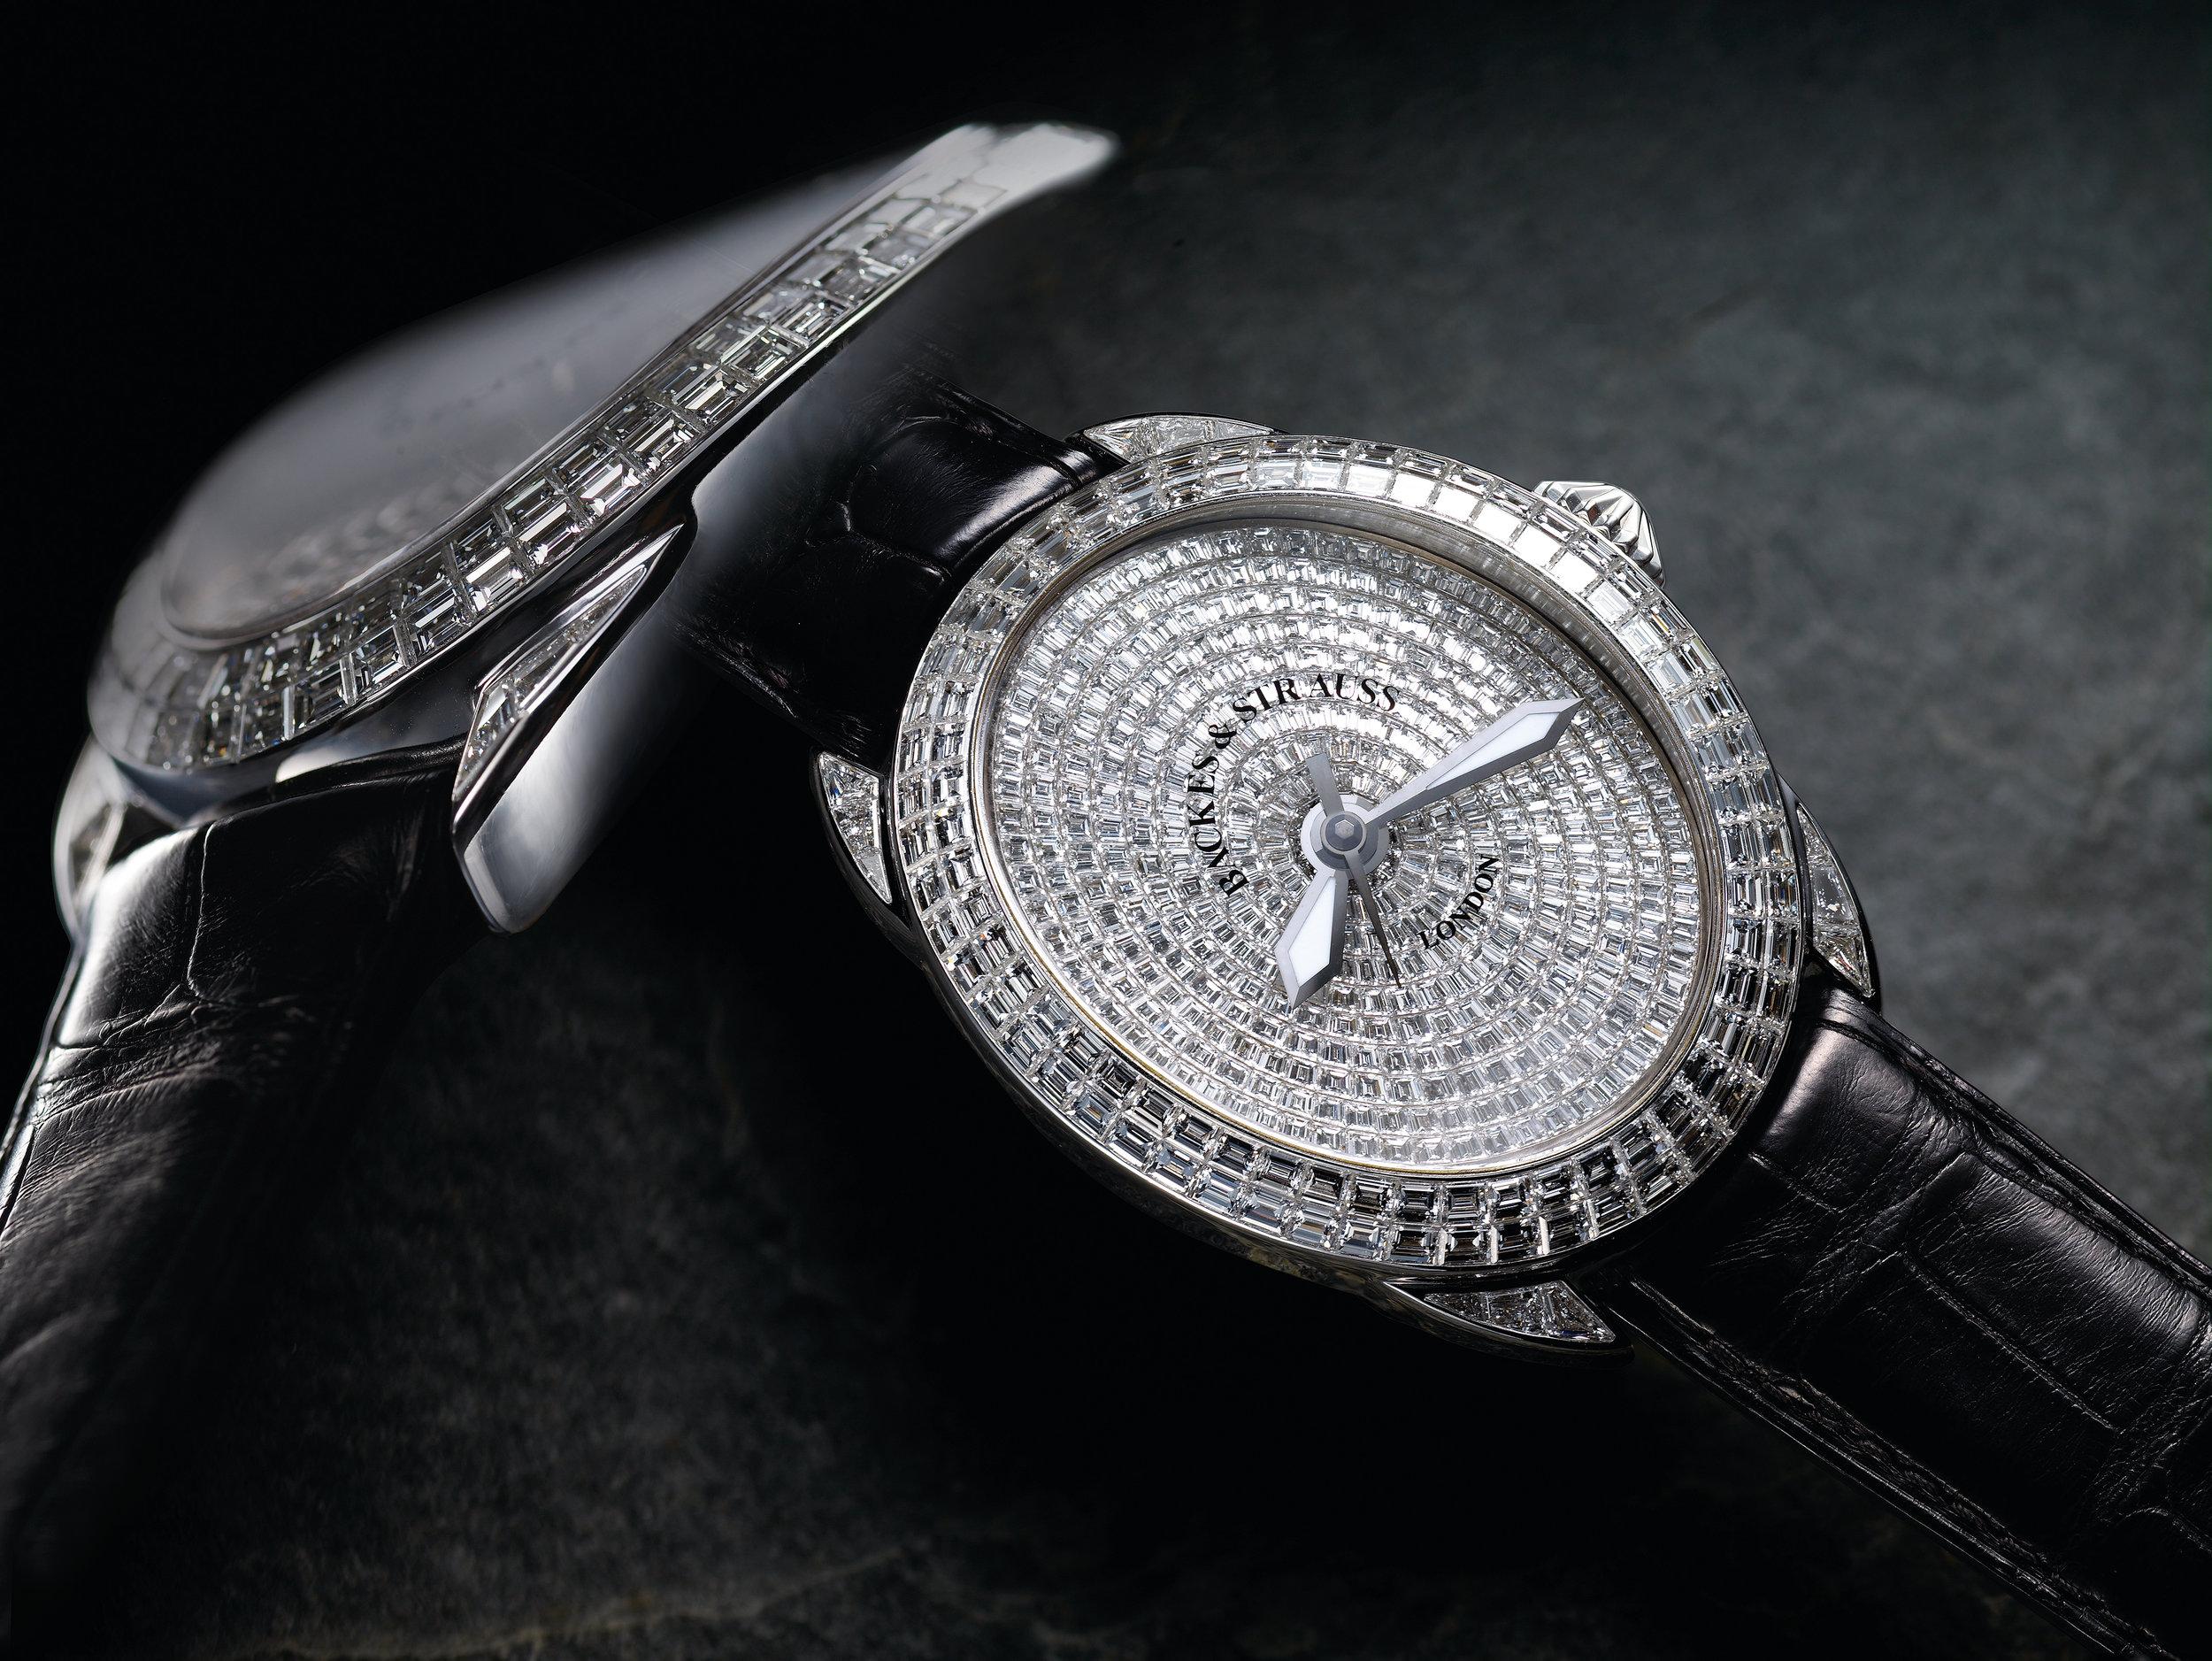 Regent Prince 4452 iconic diamond encrusted watch